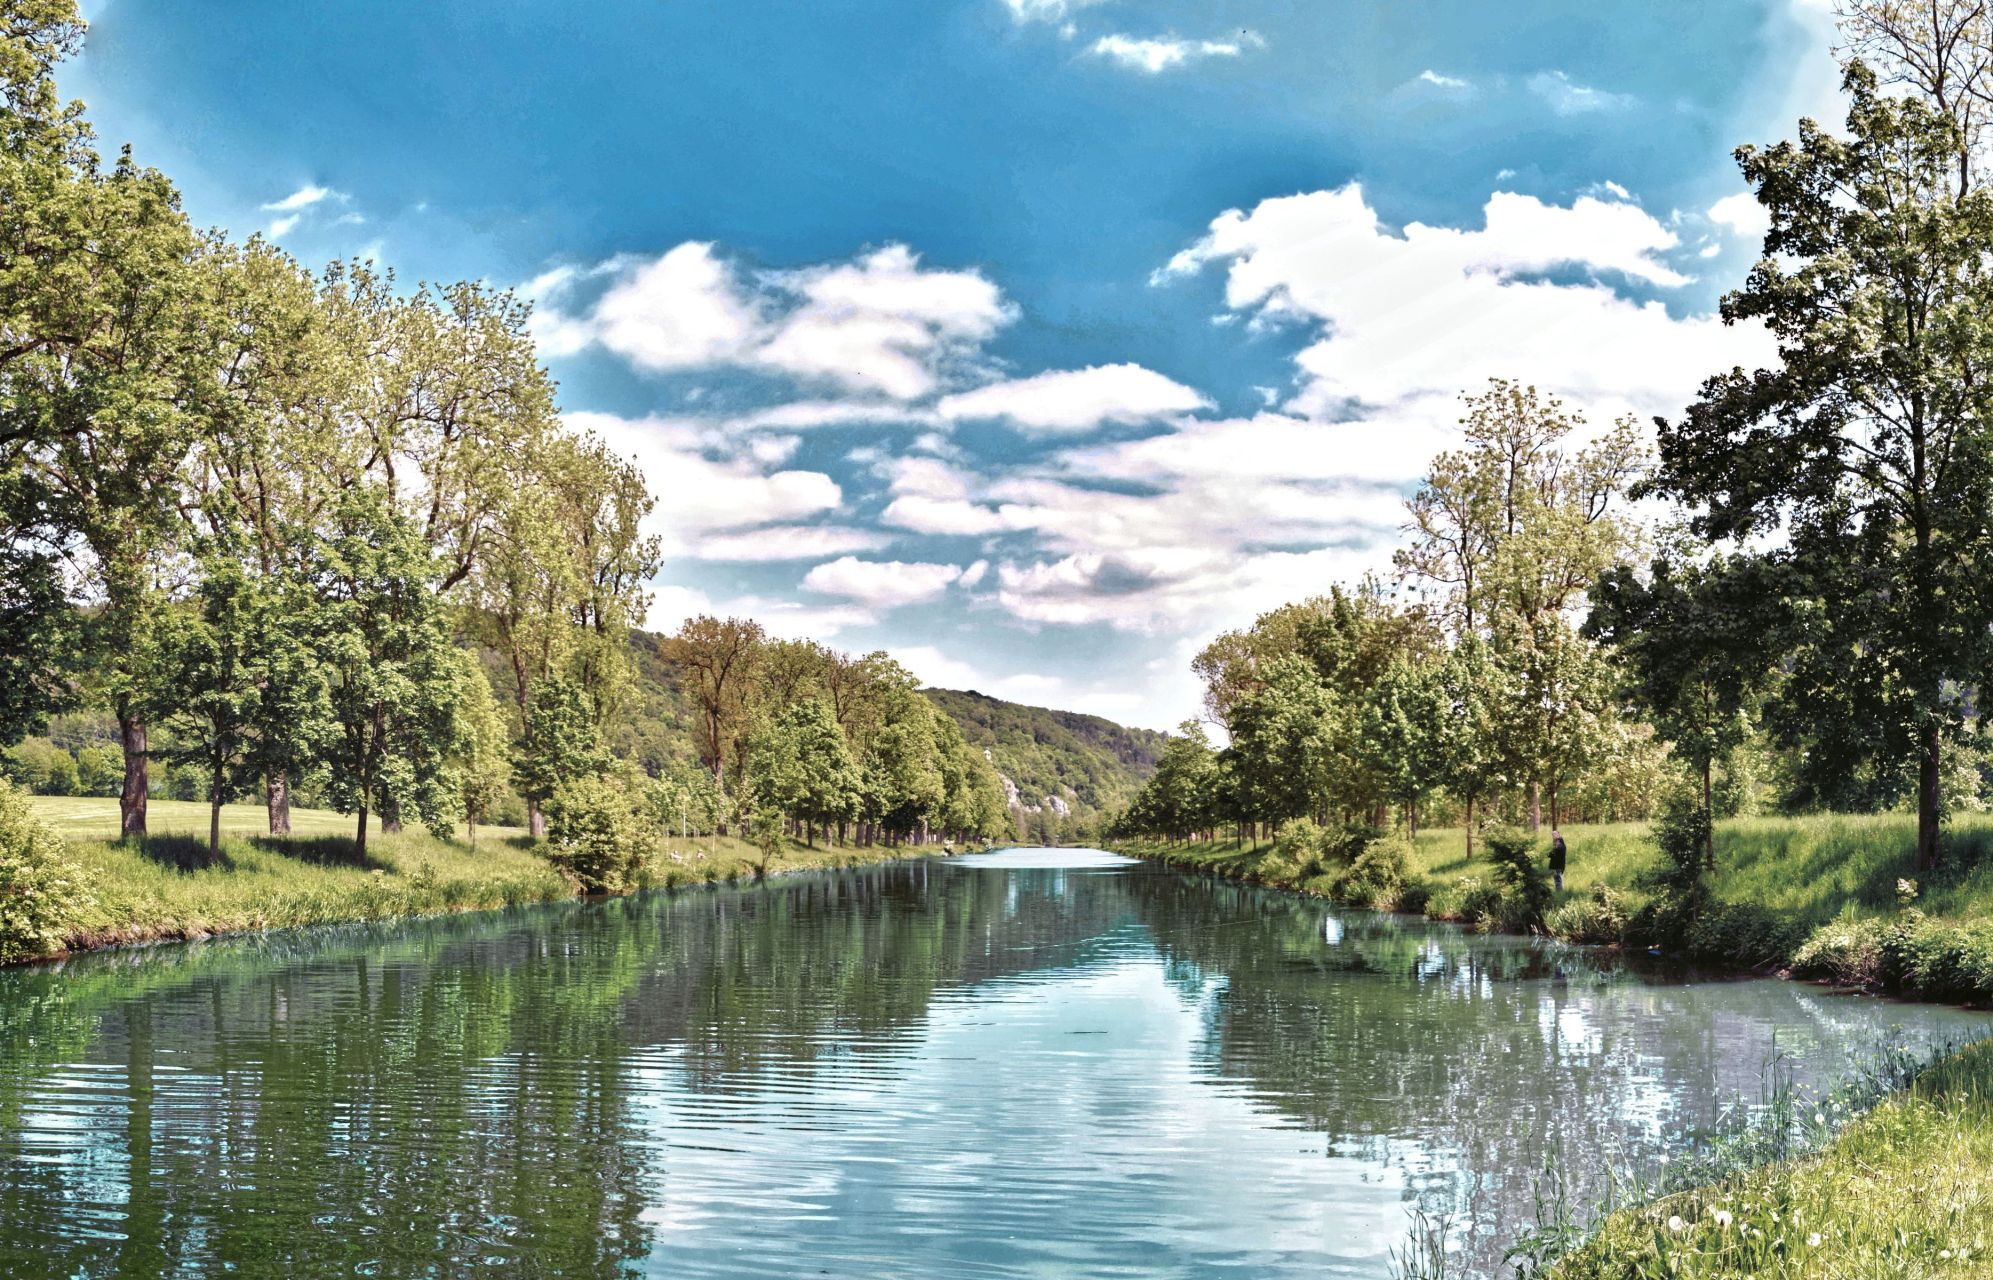 Am alten Ludwig-Donau-Main-Kanal bei Essing